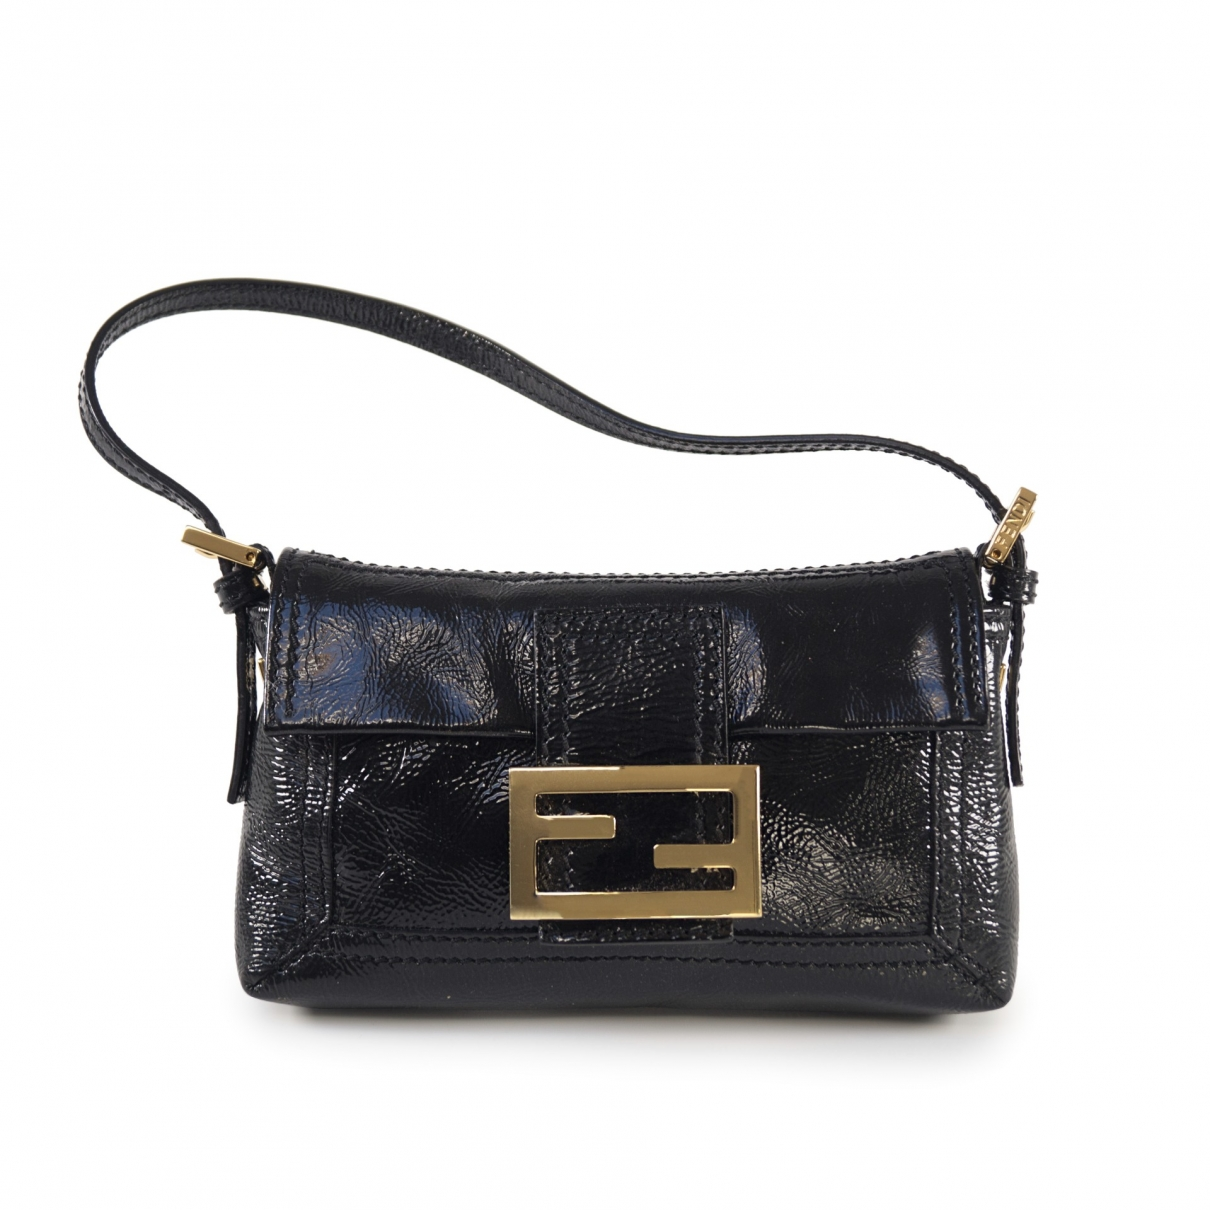 Fendi Baguette Handtasche in  Schwarz Lackleder